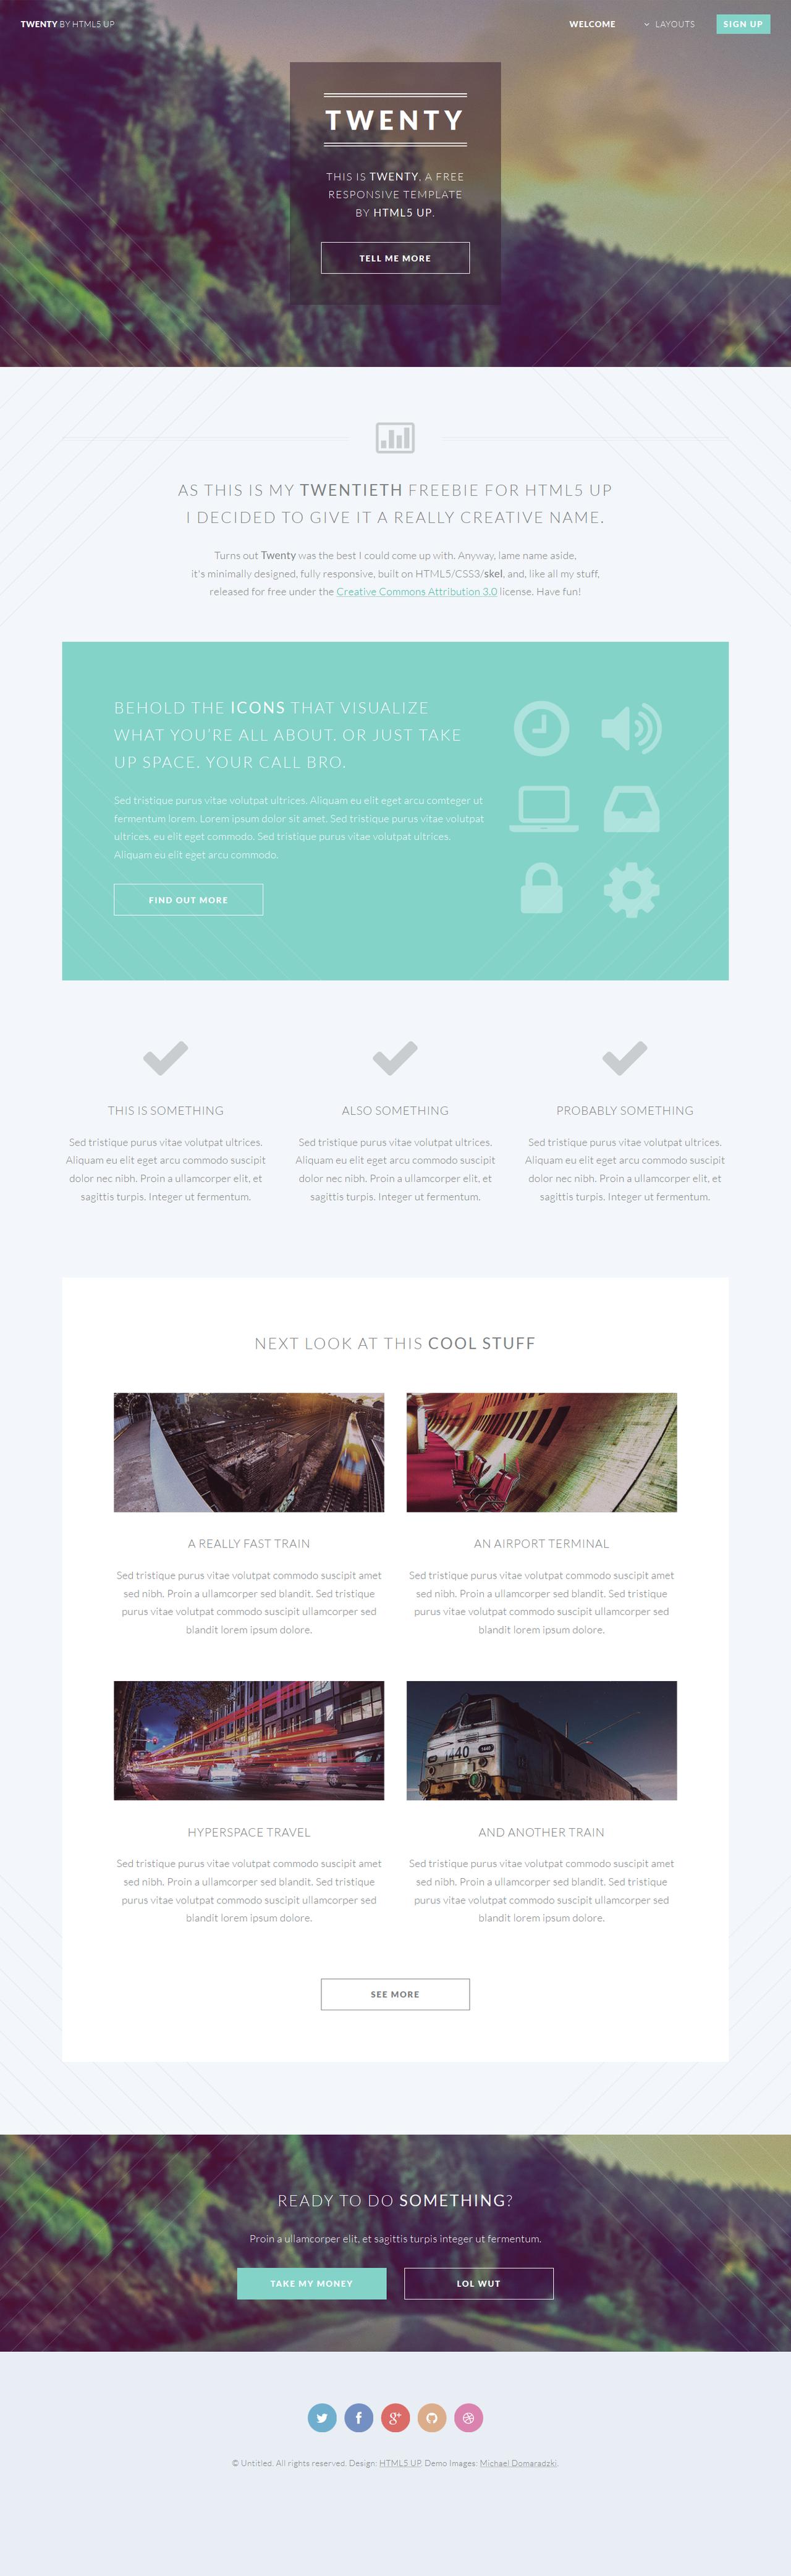 Twenty (responsive site template freebie) by nodethirtythree